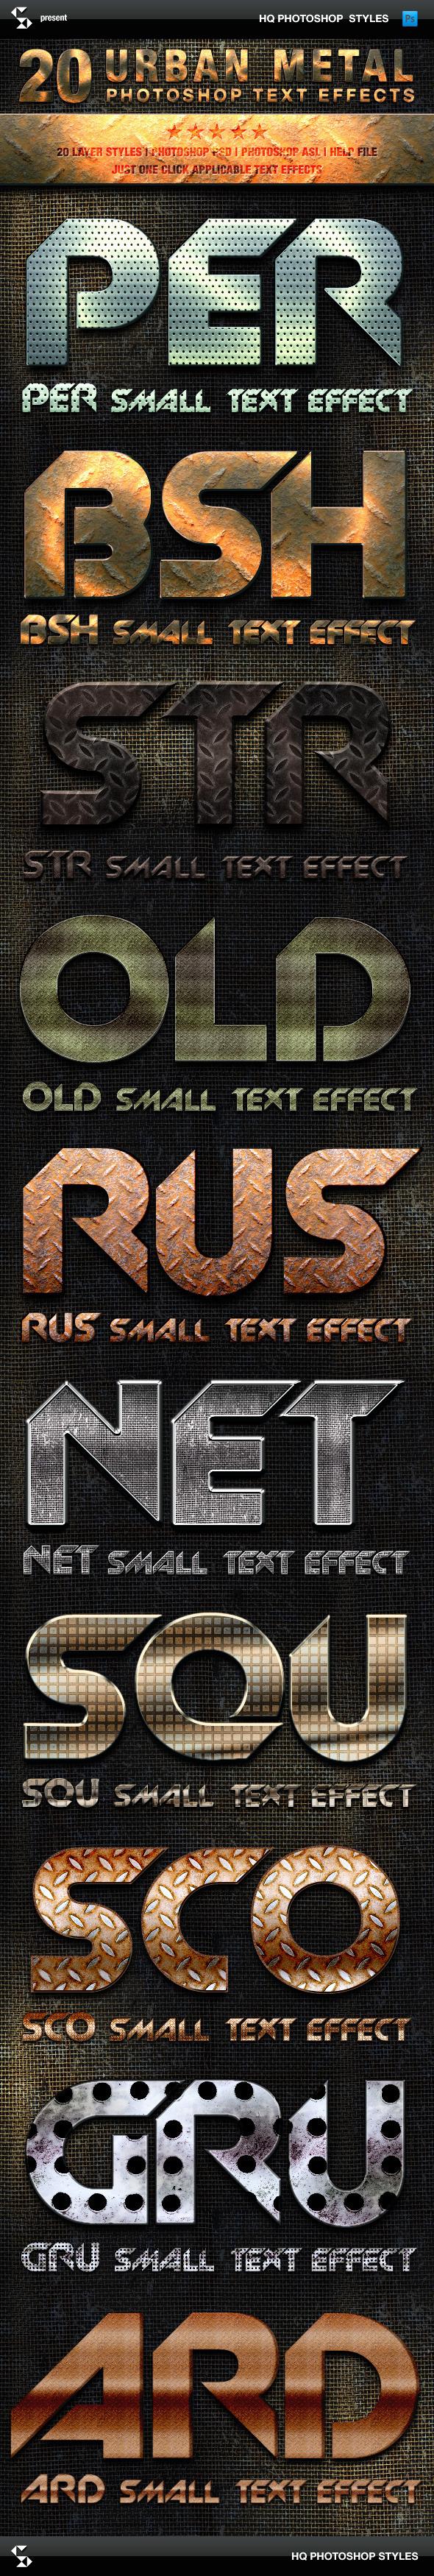 Metal Styles - Urban Metal Text Effects